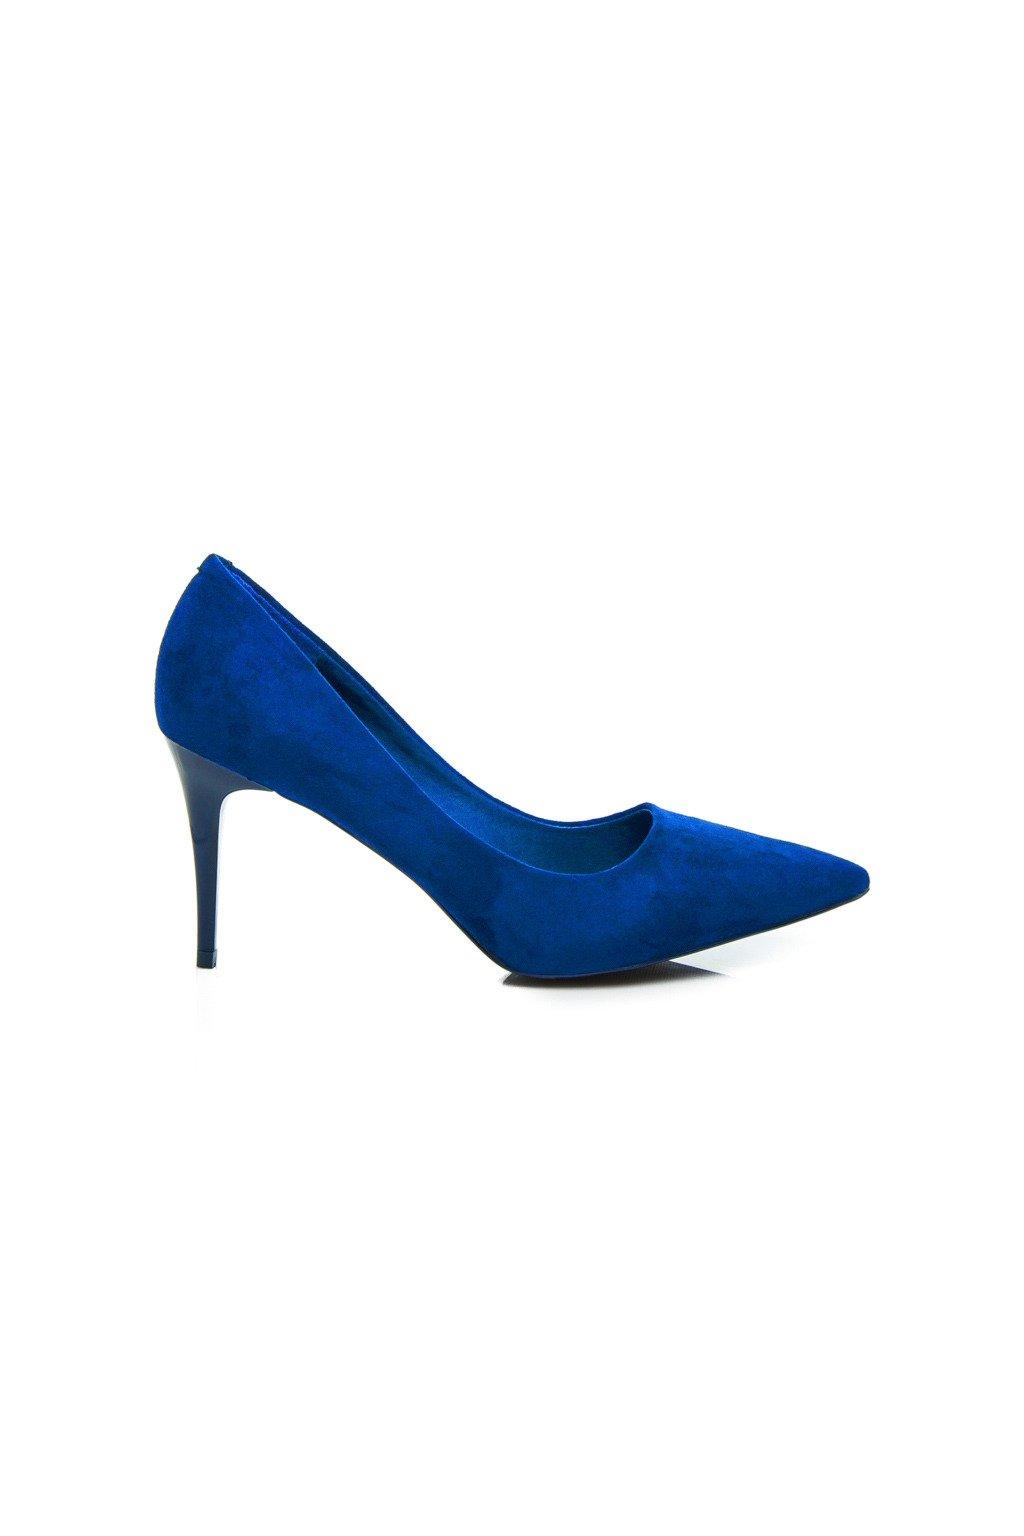 Modré dámske lodičky Comer NJSK EL1619BL